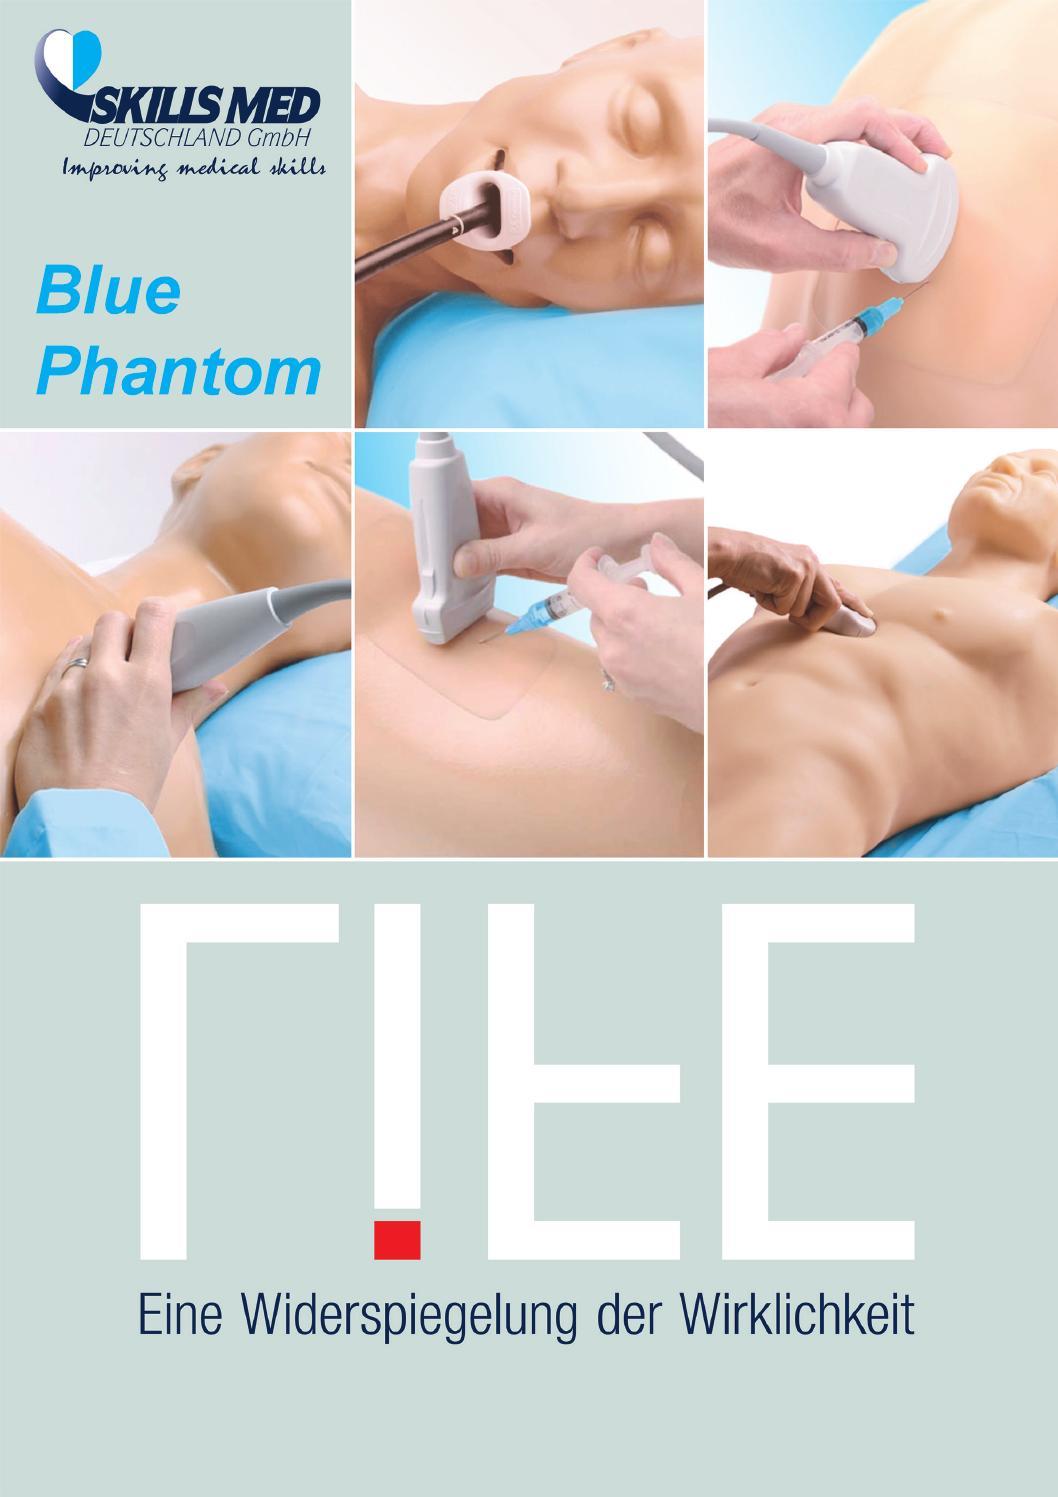 Blue phantom broschüre 2014 by Tina Marquardt - issuu